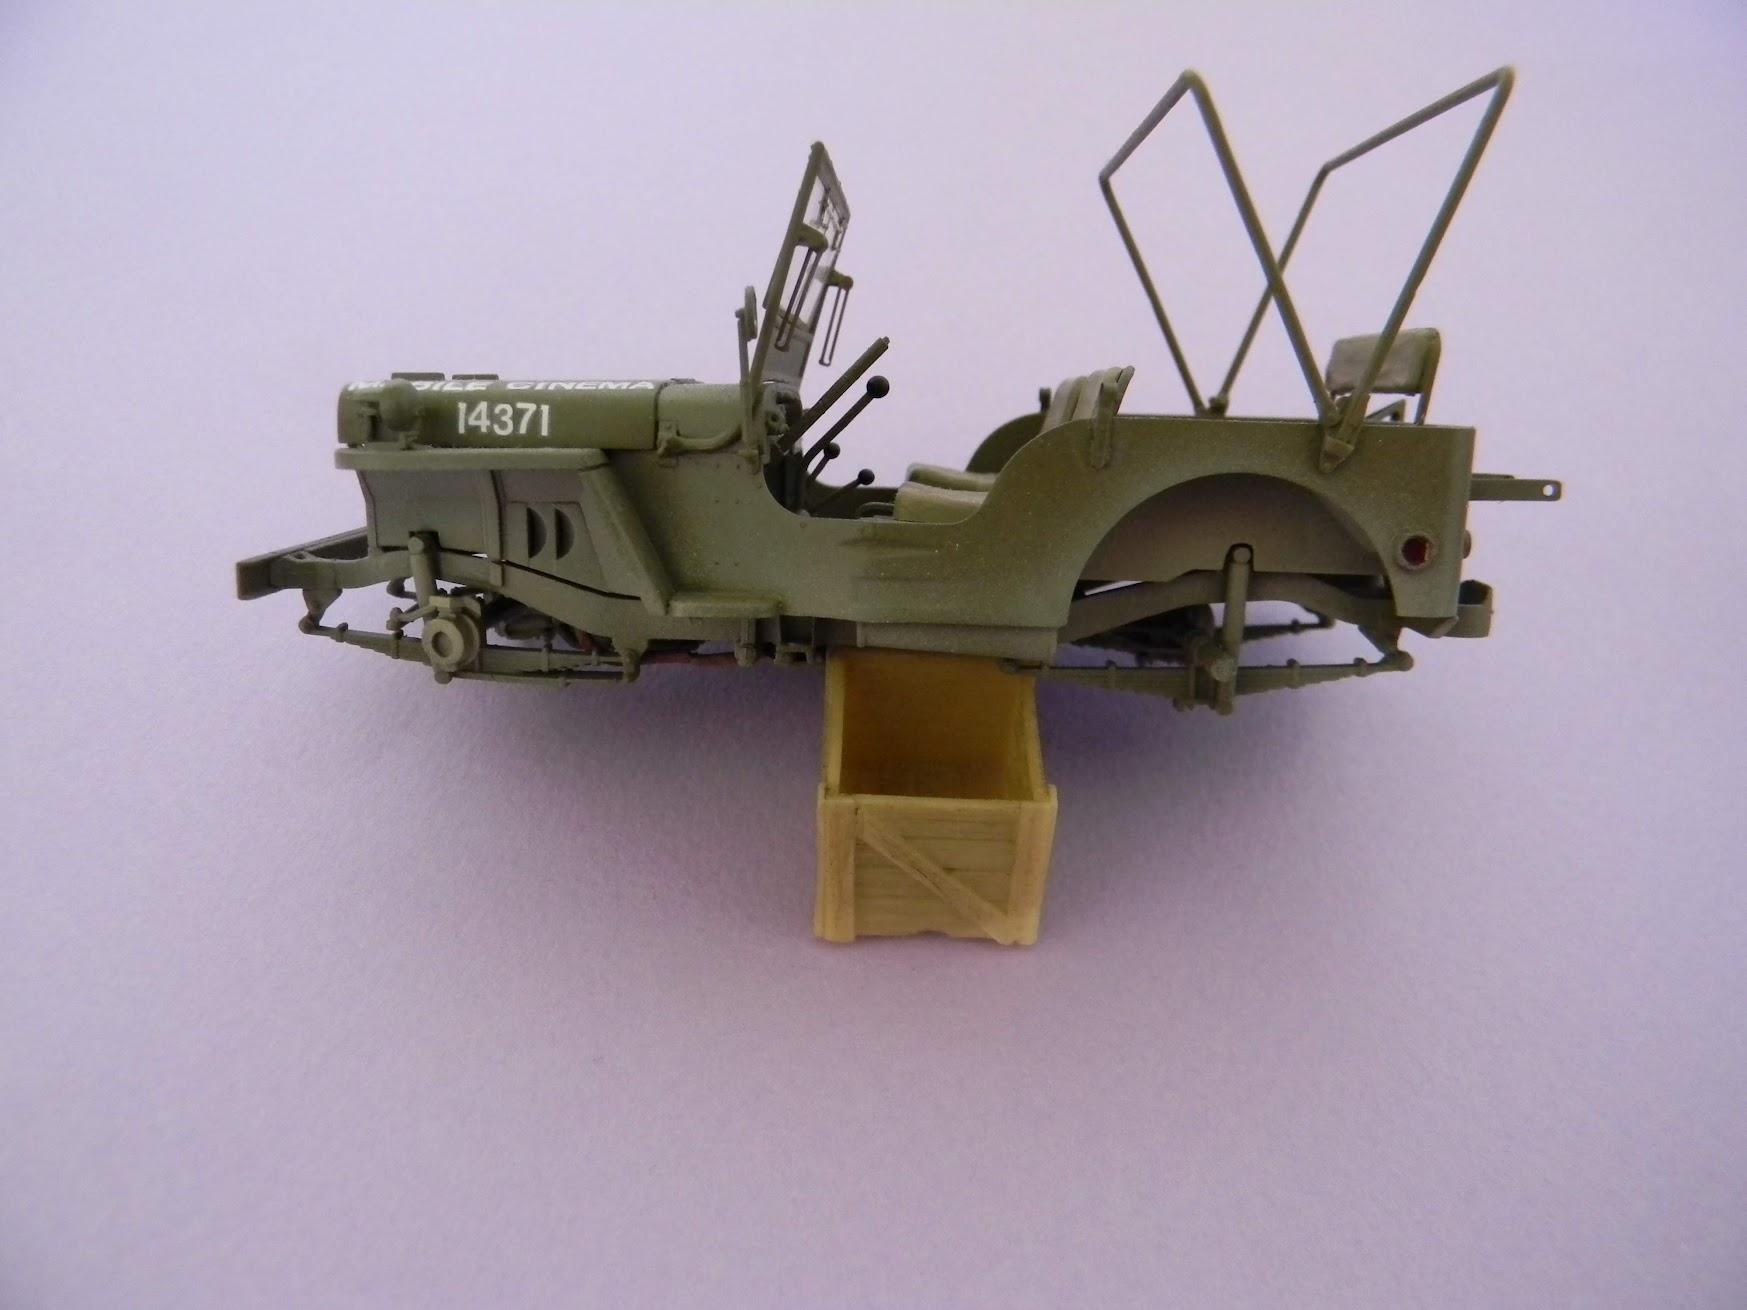 GPW 1942 Ford Bronco Model : revue de détail et montage - Page 5 IPrMx2etZMJeCEiLAKvE8Ad6sJRr0LSx-uEn3U15SUxwycP5ja0fUP7kUMlqAfzneqgpAa5wyi5ZS7W1U6W0mUF8Sy-Gv4PSi5w4eRbhpk28awXUF9vYvG7S30d7UO-0zAzB-jCG2VpYEHD1HyQzoQ-p8xC7ZVyOUqhcxcqziVe7OJ1ySEQVyjO1RcXBupmG380ZinauxSmpenHkEfqaguUhktfbHH3_XxoYlUNVYth193BkrOJOoATQFtmo25fud_Dwj9TJlh7gPQDimO_OhFR4p-boYV4dXIpKDGB0kVlv7z5GRqDBbGu5ju54aEeiV_bCVdJD8WVA3aXHcf2Rs6jOcMhT2sAgoHQRpAXasBFNAvq1K7dQ3eo4nqNIhx7ivE0HTqqUBJJK5rd7qofohMTon2kt_bNE5u60b0H9PrYO03TVrrwyqviL_ipO-rDElVP-me4grdMPhjvs0QYyRnHnlLvLn_mAOcium5XGBn3Q0lR7jFTaECsvrib5QOpIzYayOst4D41CNU9iLBHPrCrysRVgwhpPDoIUHV7HasM_g63l5DGycfYiYxPTxbWLLqXohmKgTj2LVX1Mx8I_R1Bo7j4Q8vDxLt_ZLwUB508kVsPsSaVqHO8fjdUqFkQBmKb_RXMsCREJpgQZgtzZwBaK5jAf0Zw_fC9b4_lBEFcNf_Ma7k_ys_L8mNYNrYL9l2TXp3T_zTxAmPujci-Hto1MJuJqQMsmcfo9UDGOM1ep-3XVDw=w1747-h1310-no